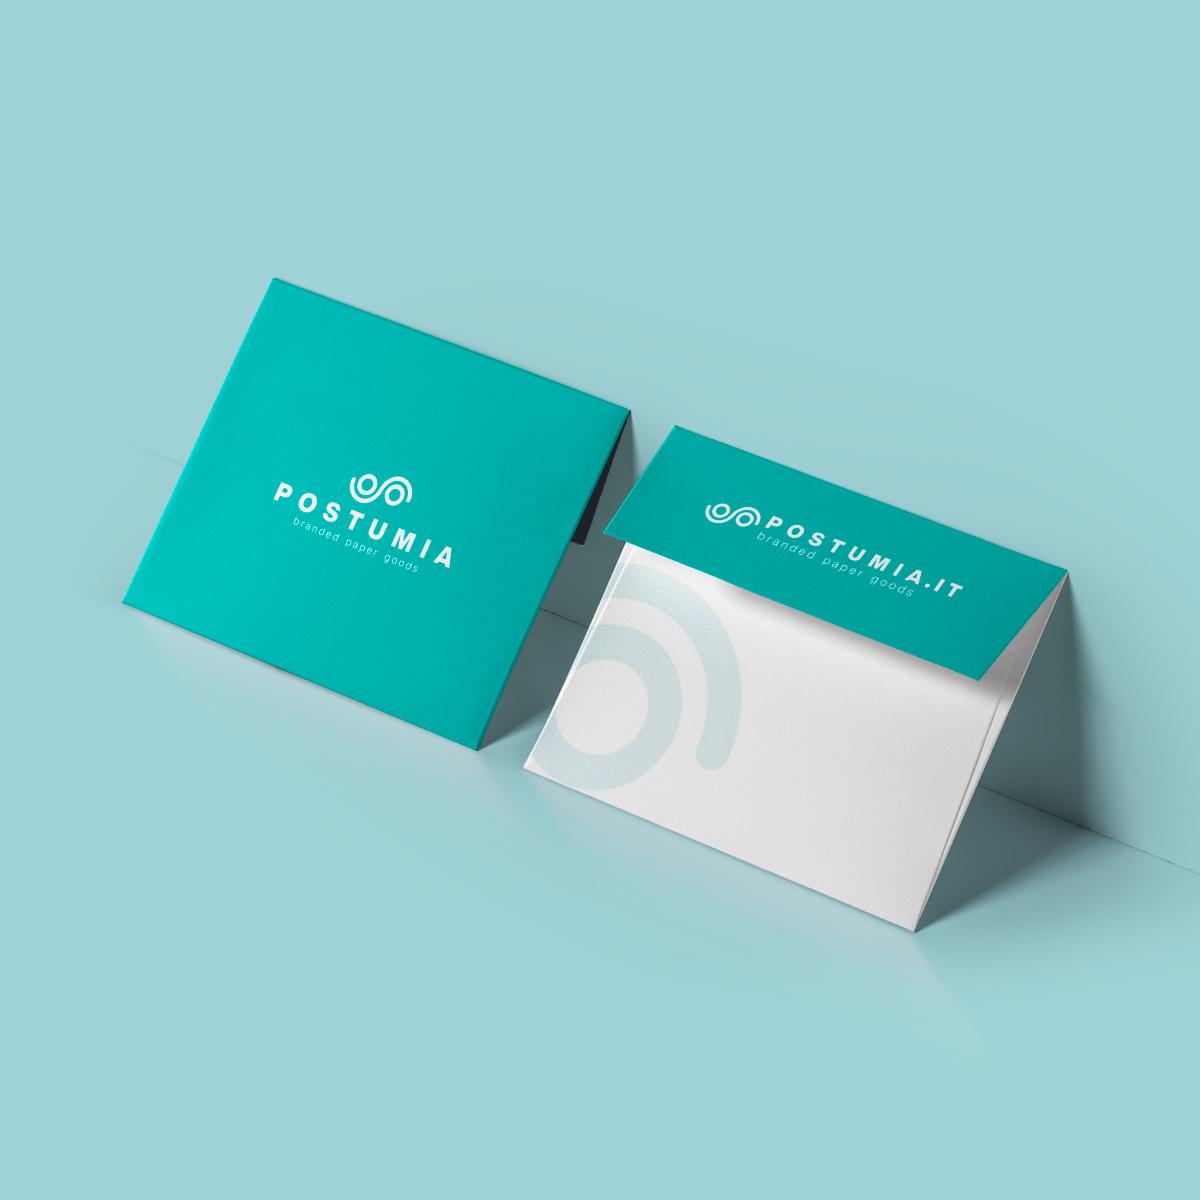 Postumia - brand identity